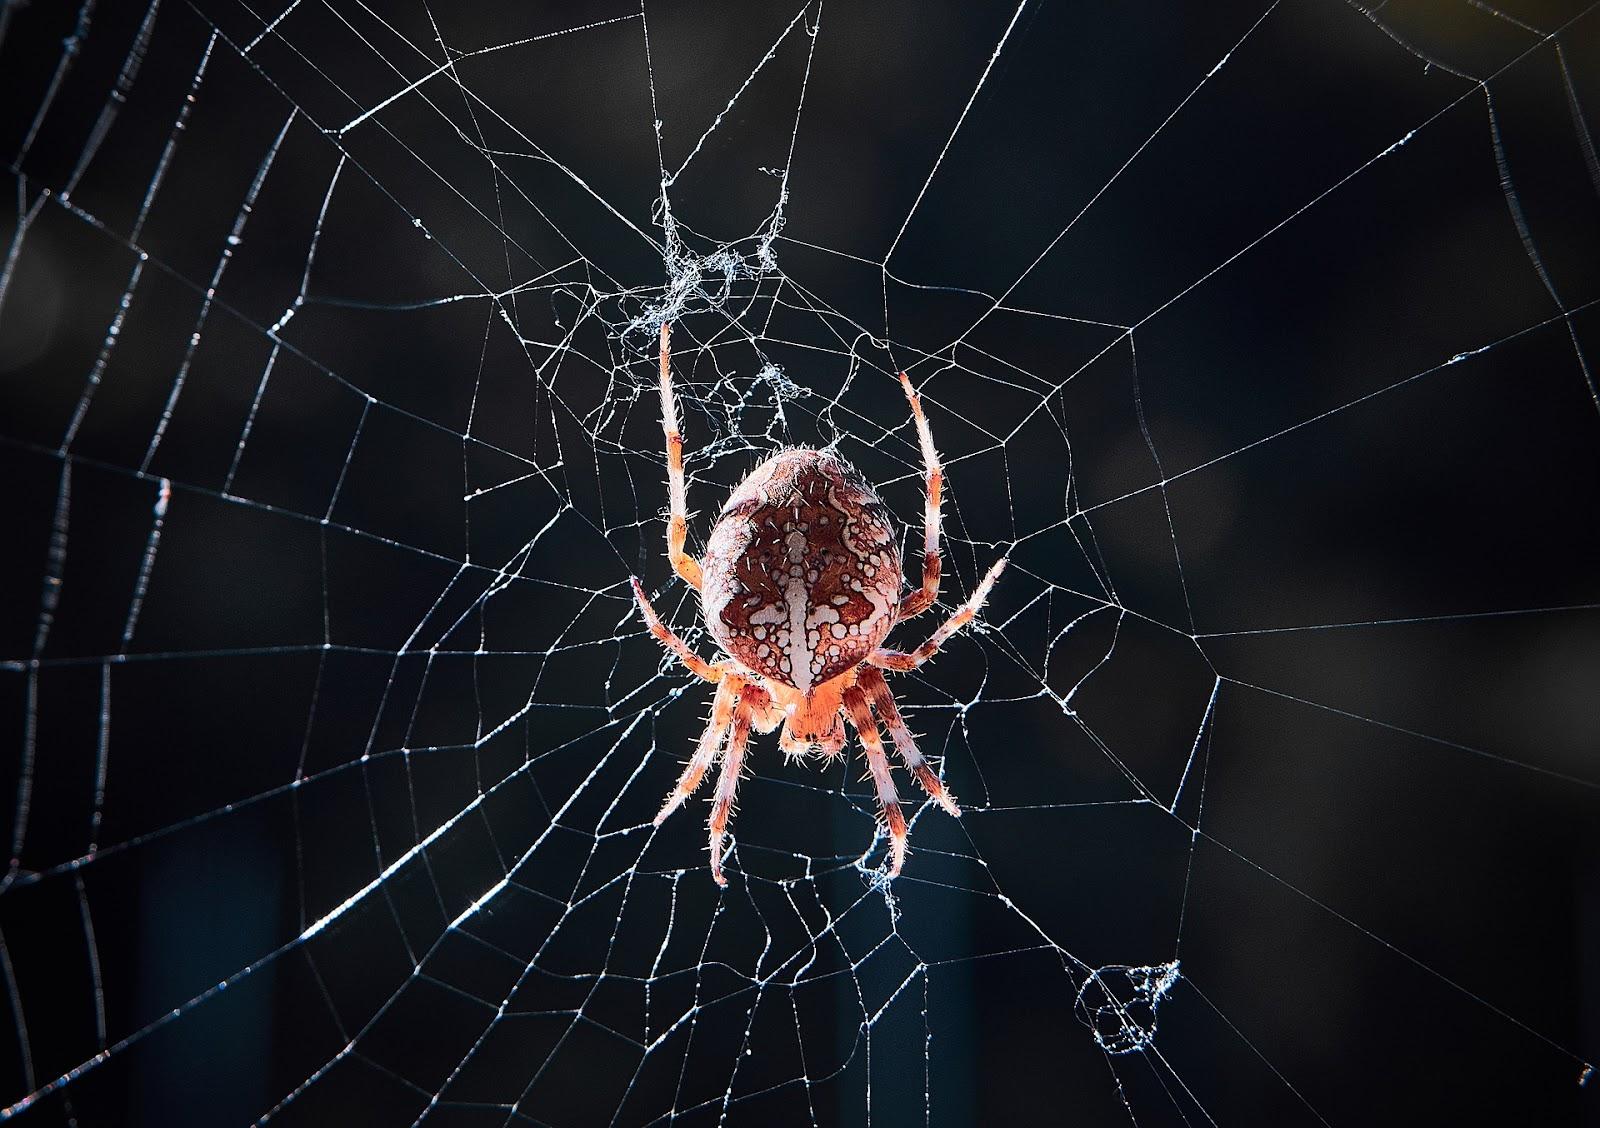 Big spider in web